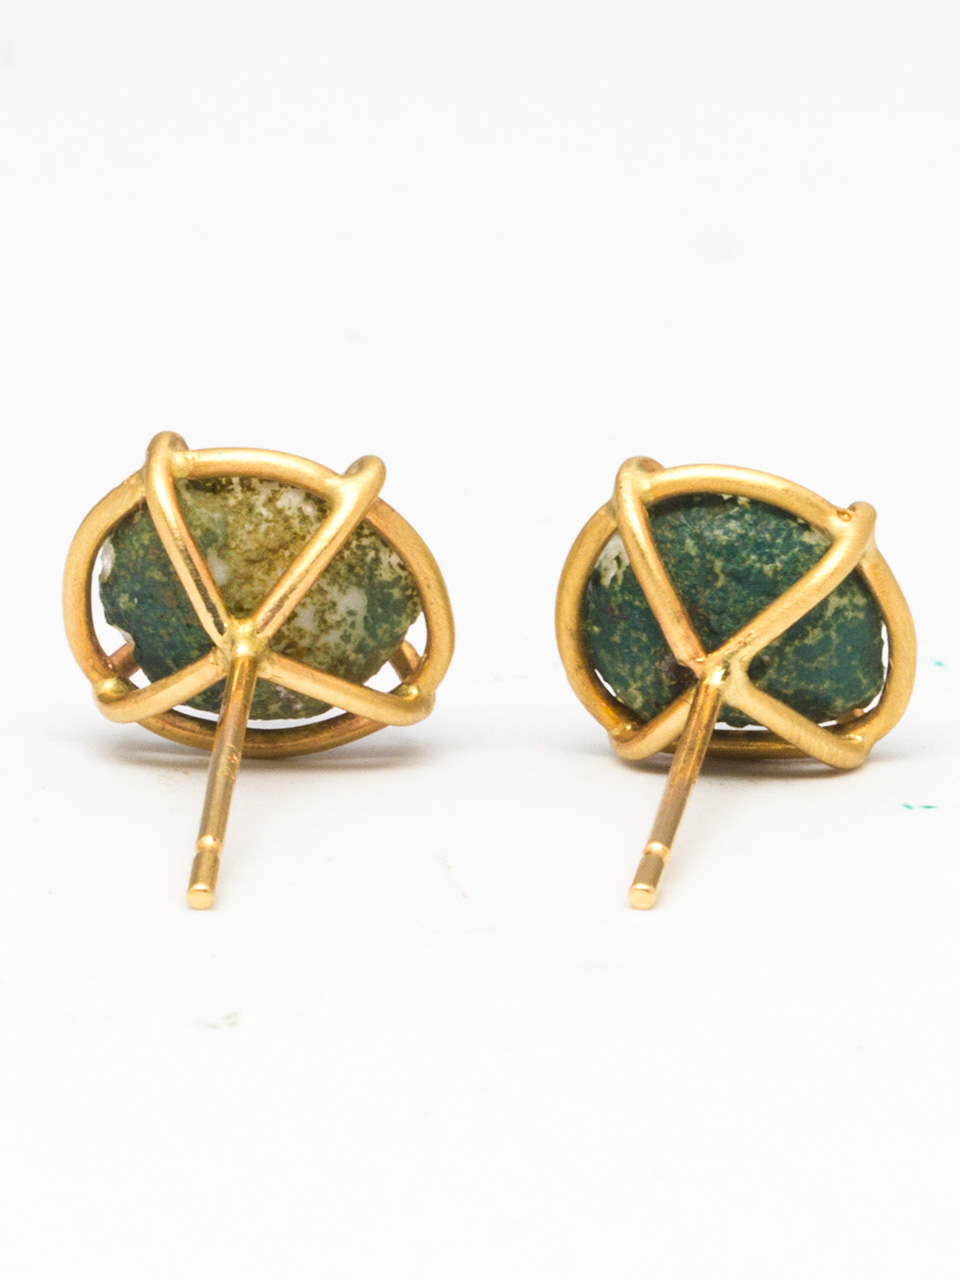 14K YG Gray/Green Agate Geode